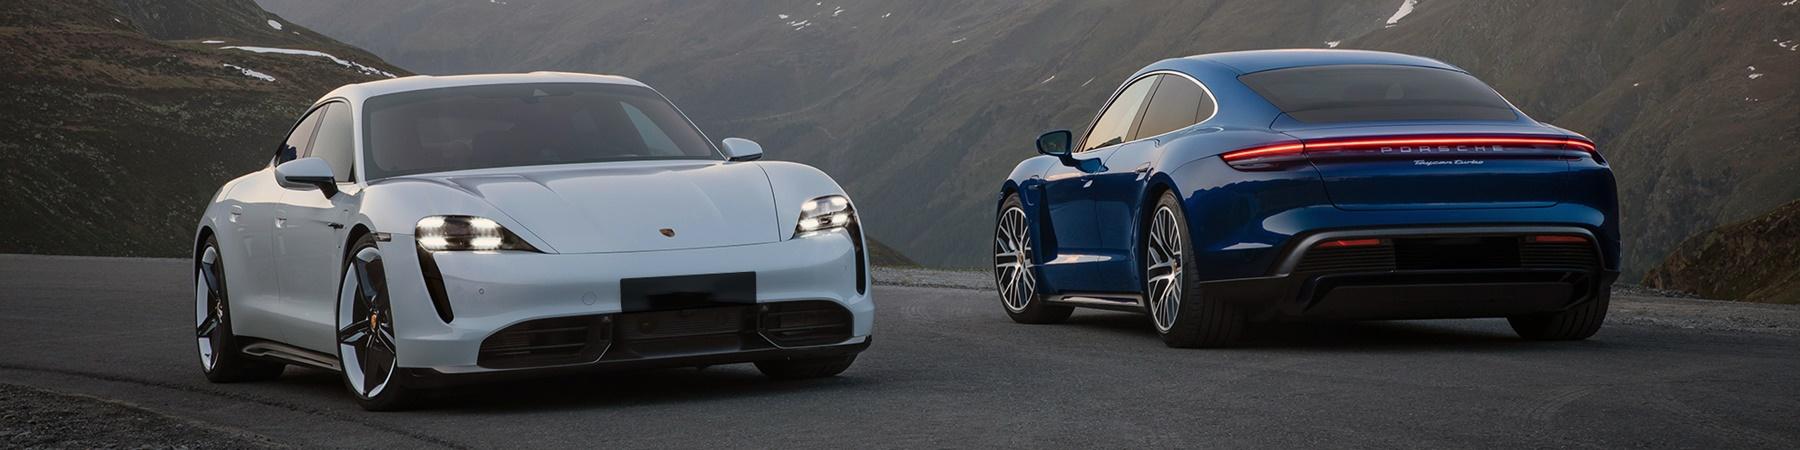 Porsche Taycan 71kWh 346 km actieradius